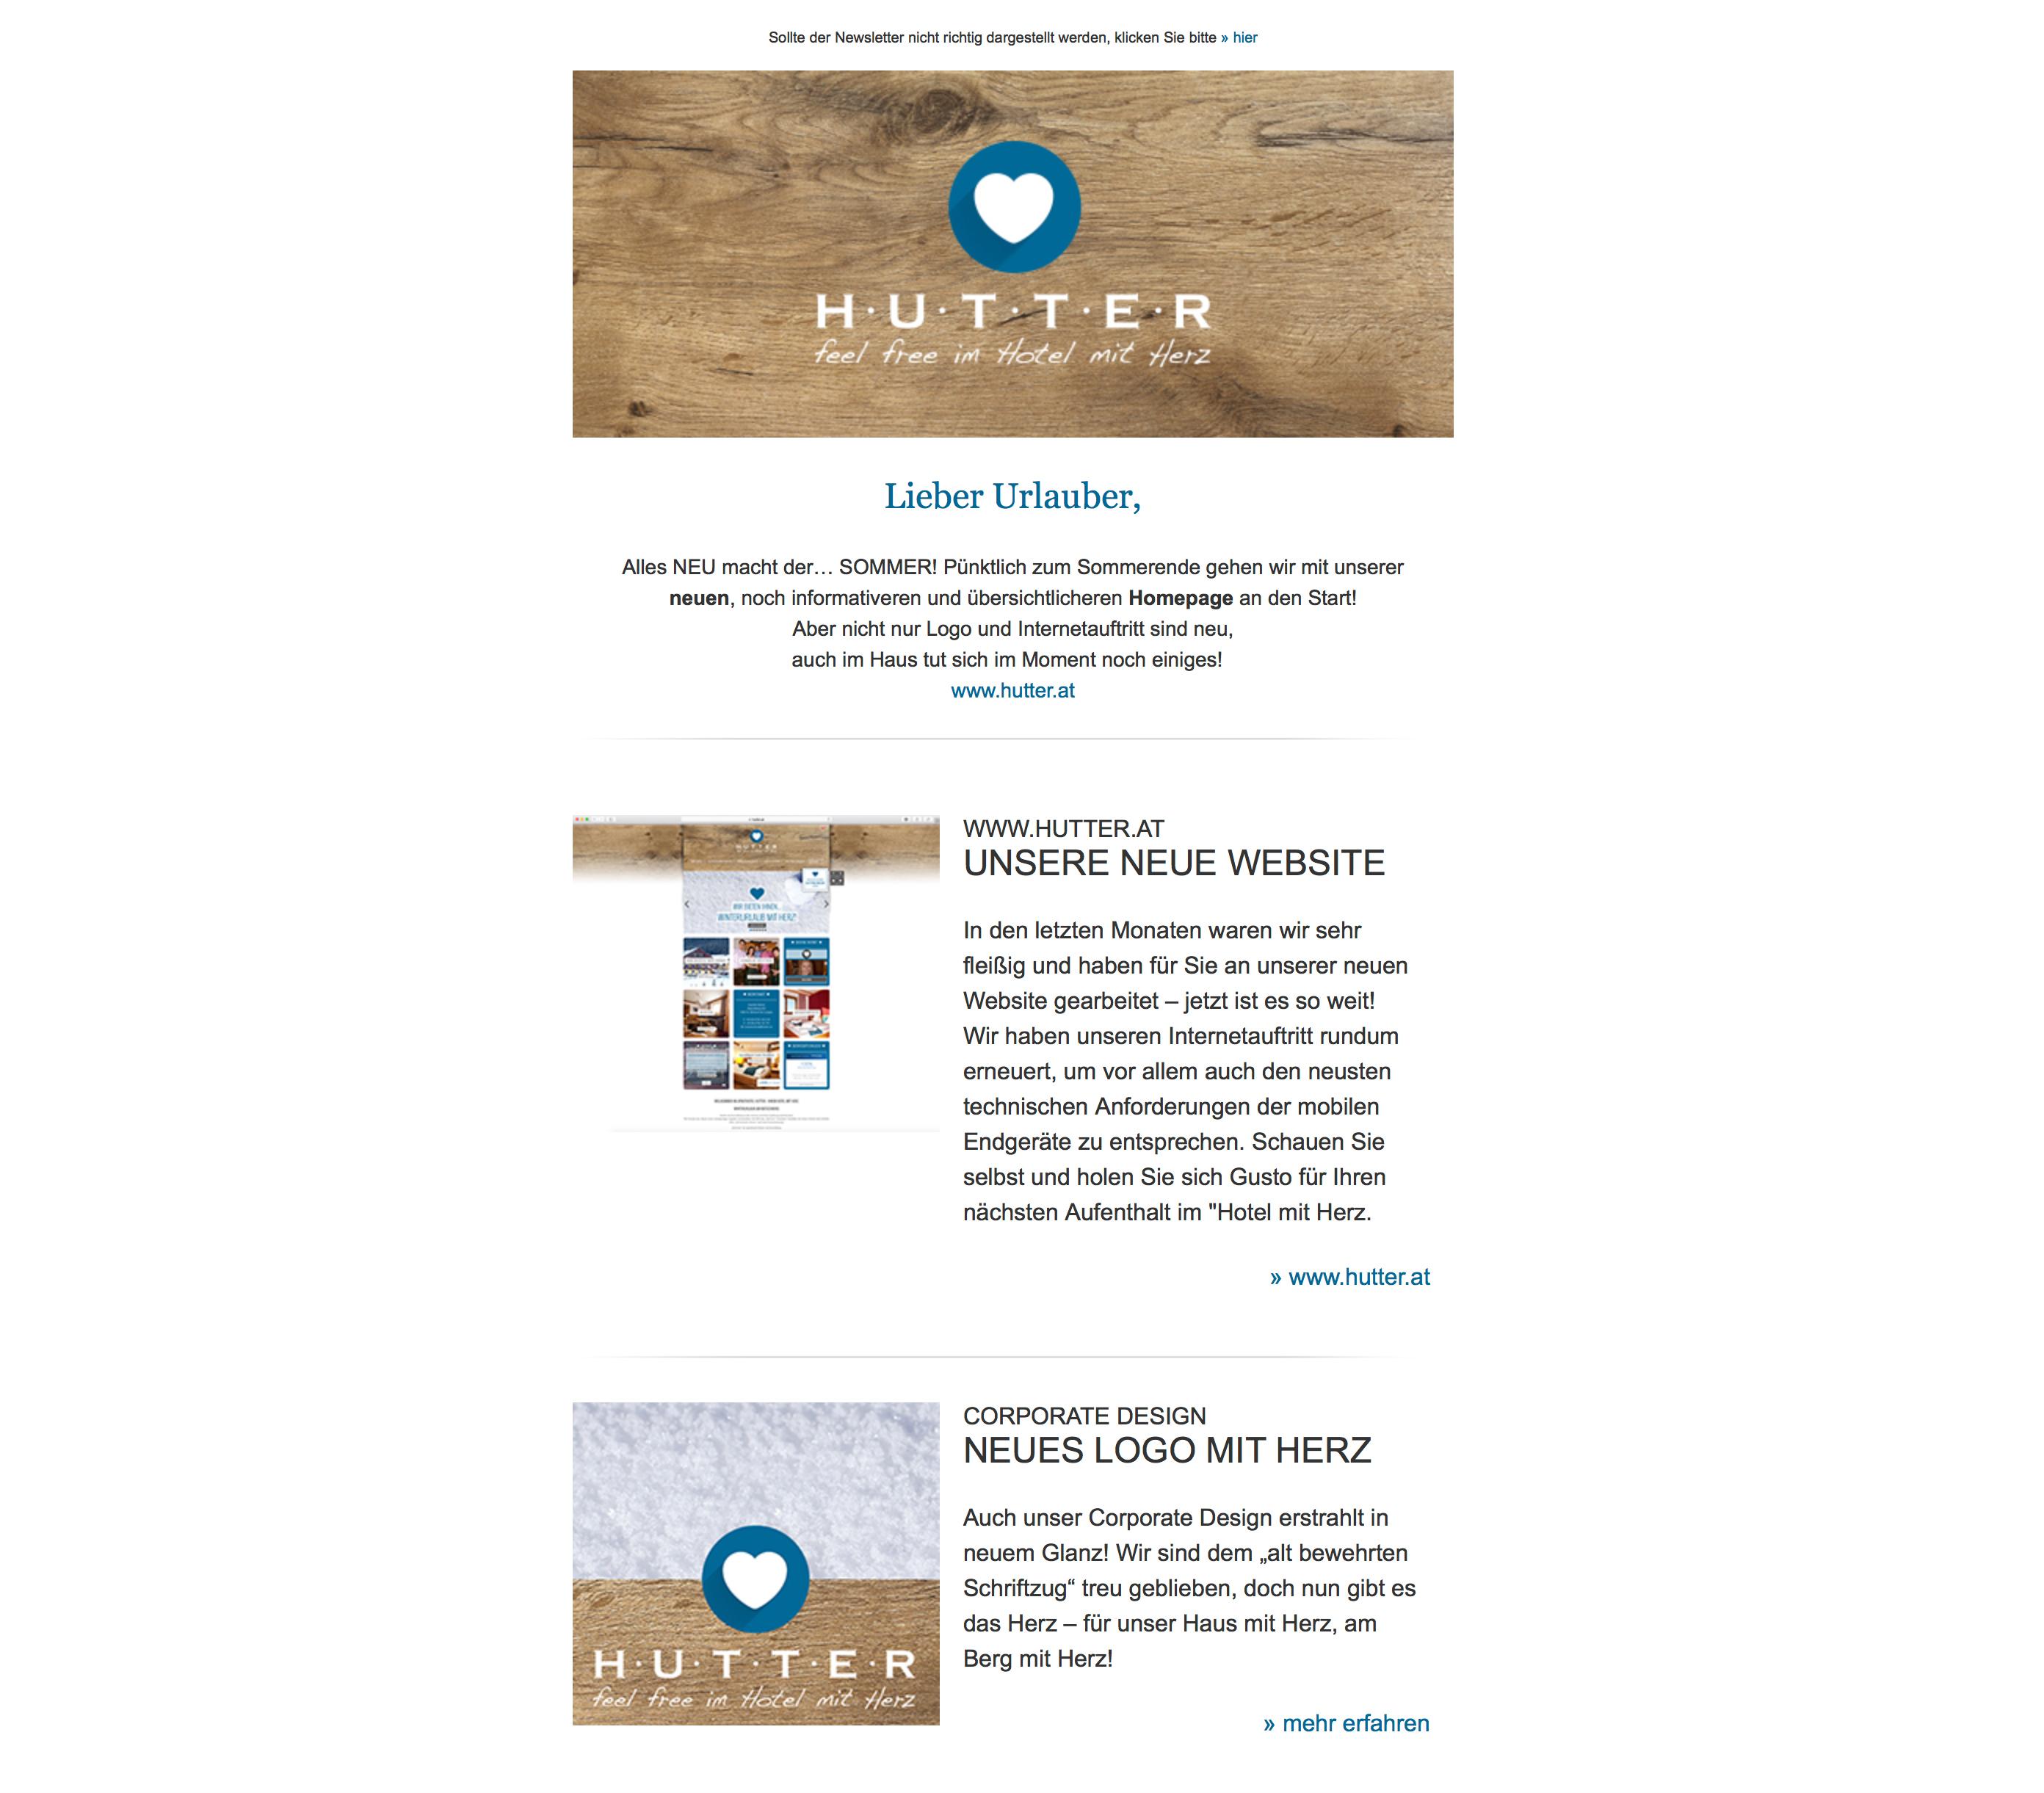 anmeldung zum newsletter service 4 hotel hutter katschberg. Black Bedroom Furniture Sets. Home Design Ideas